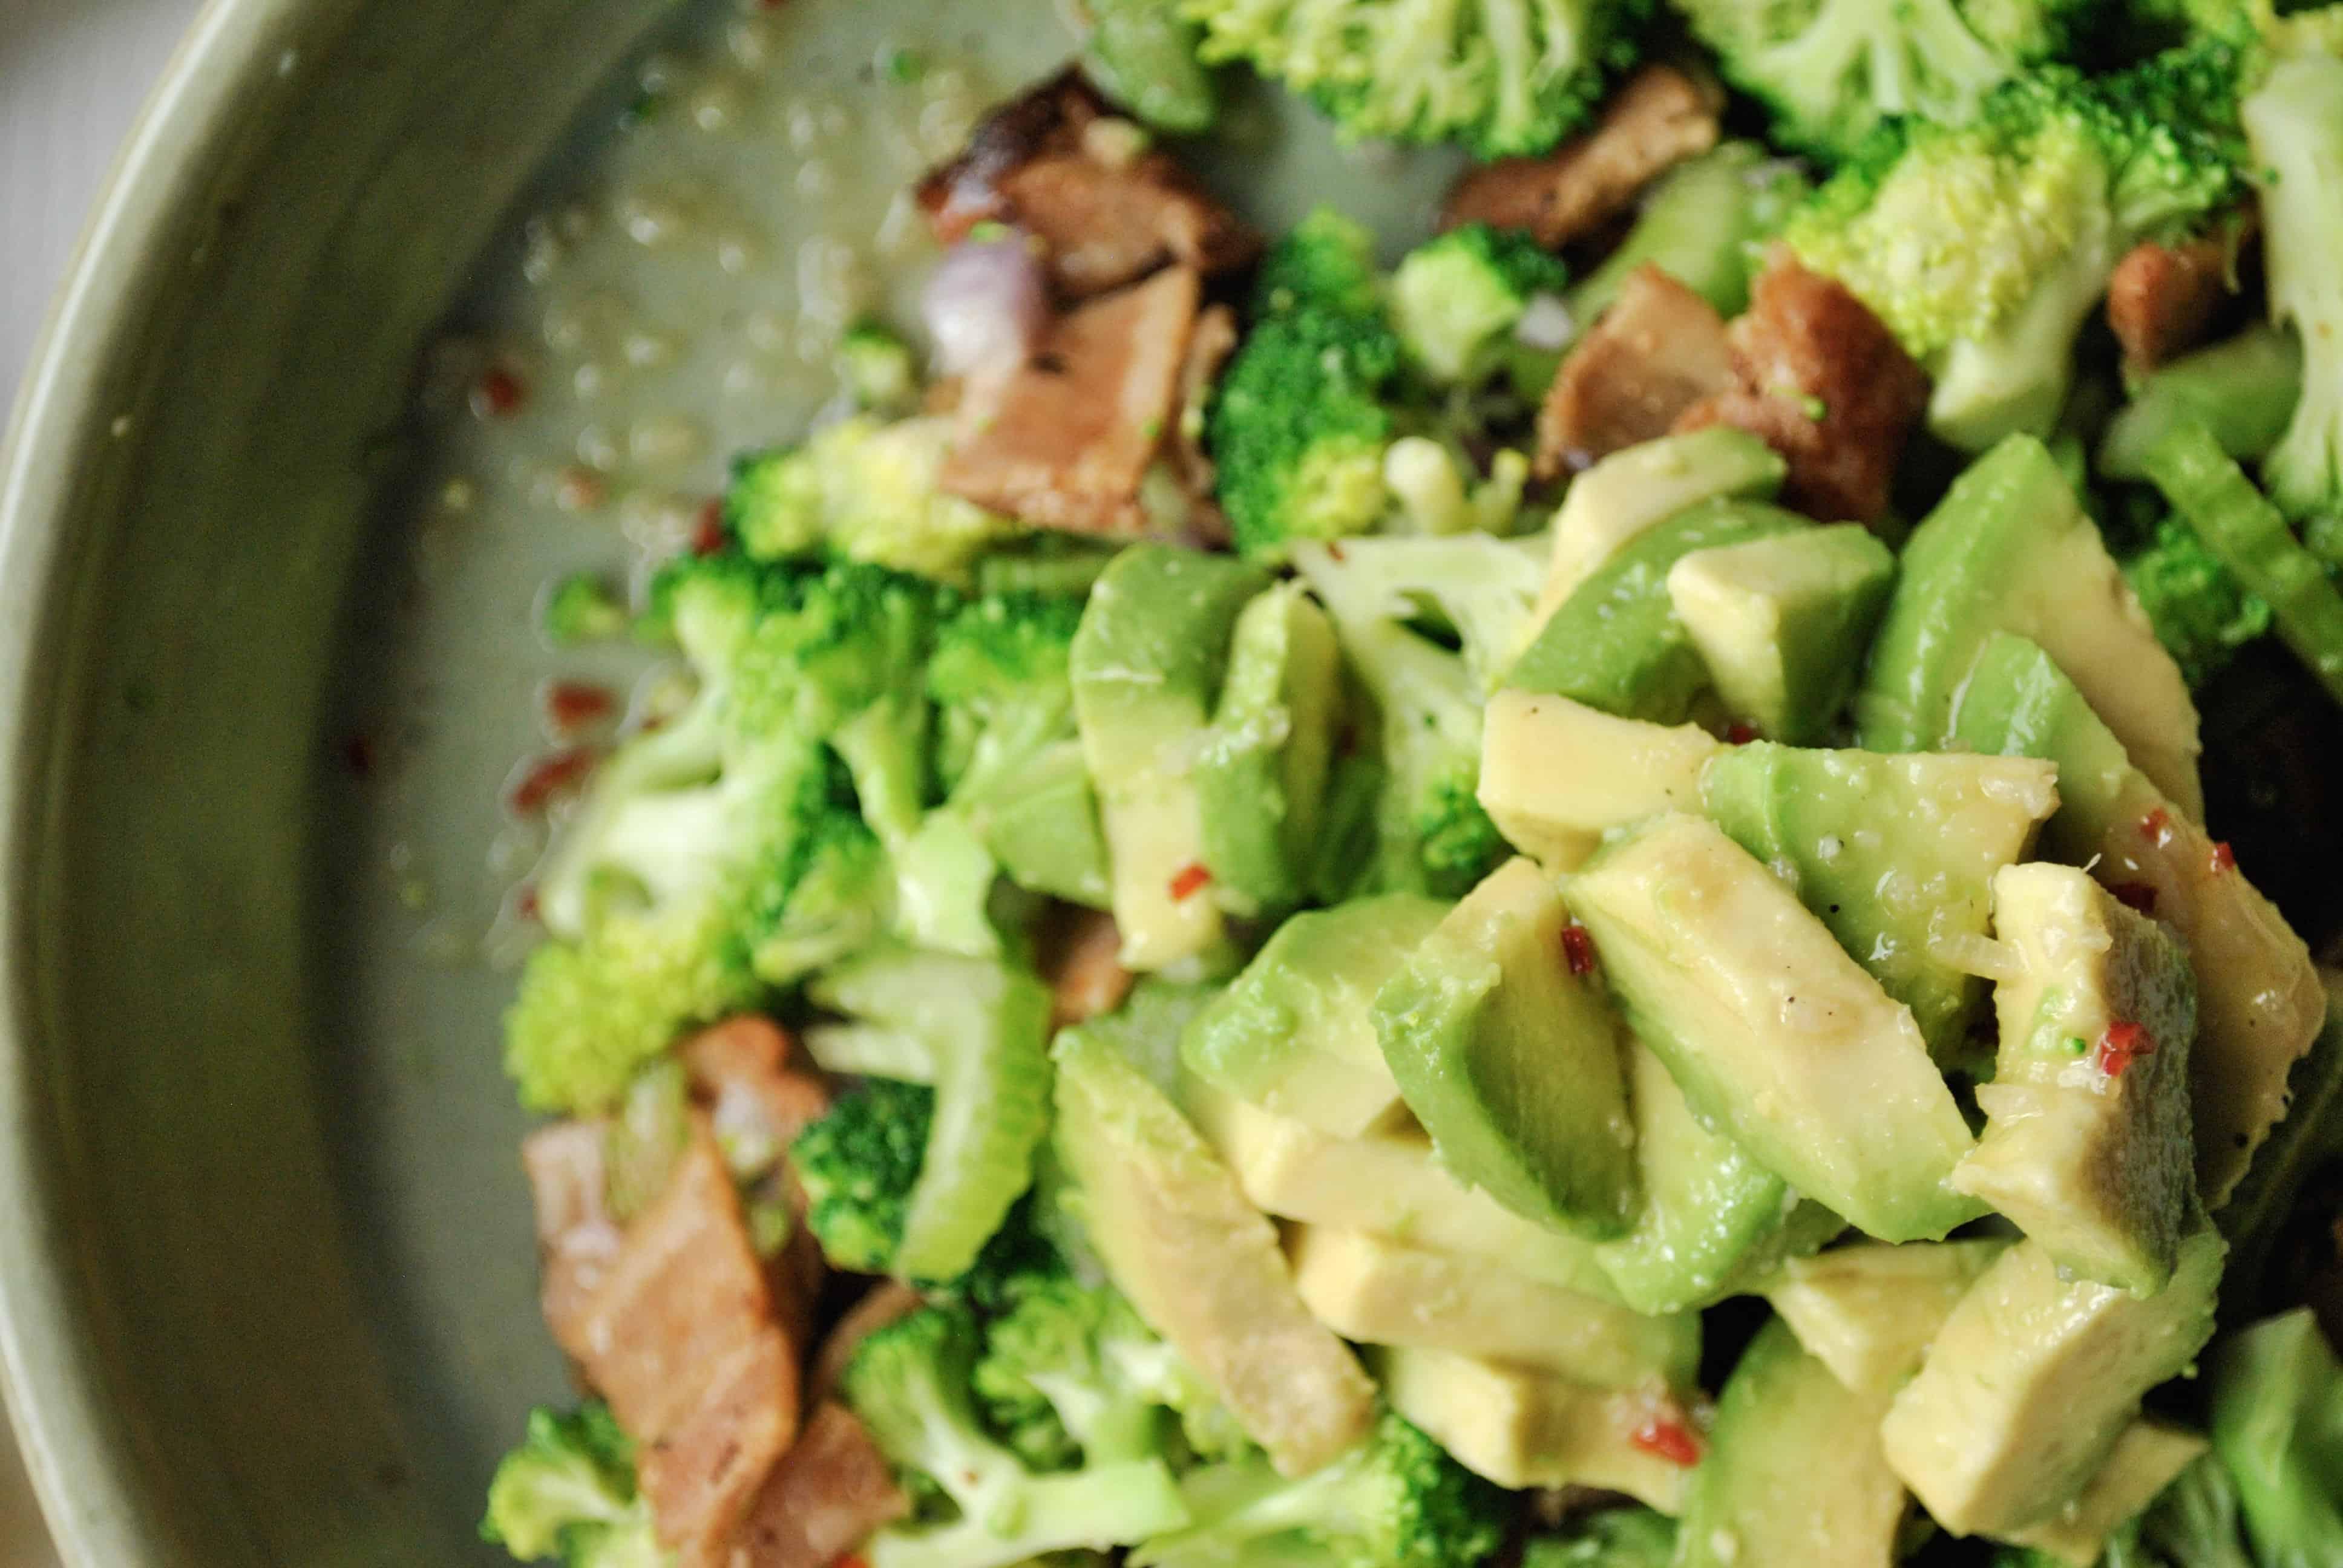 Bacon and Broccoli Salad with Avocado